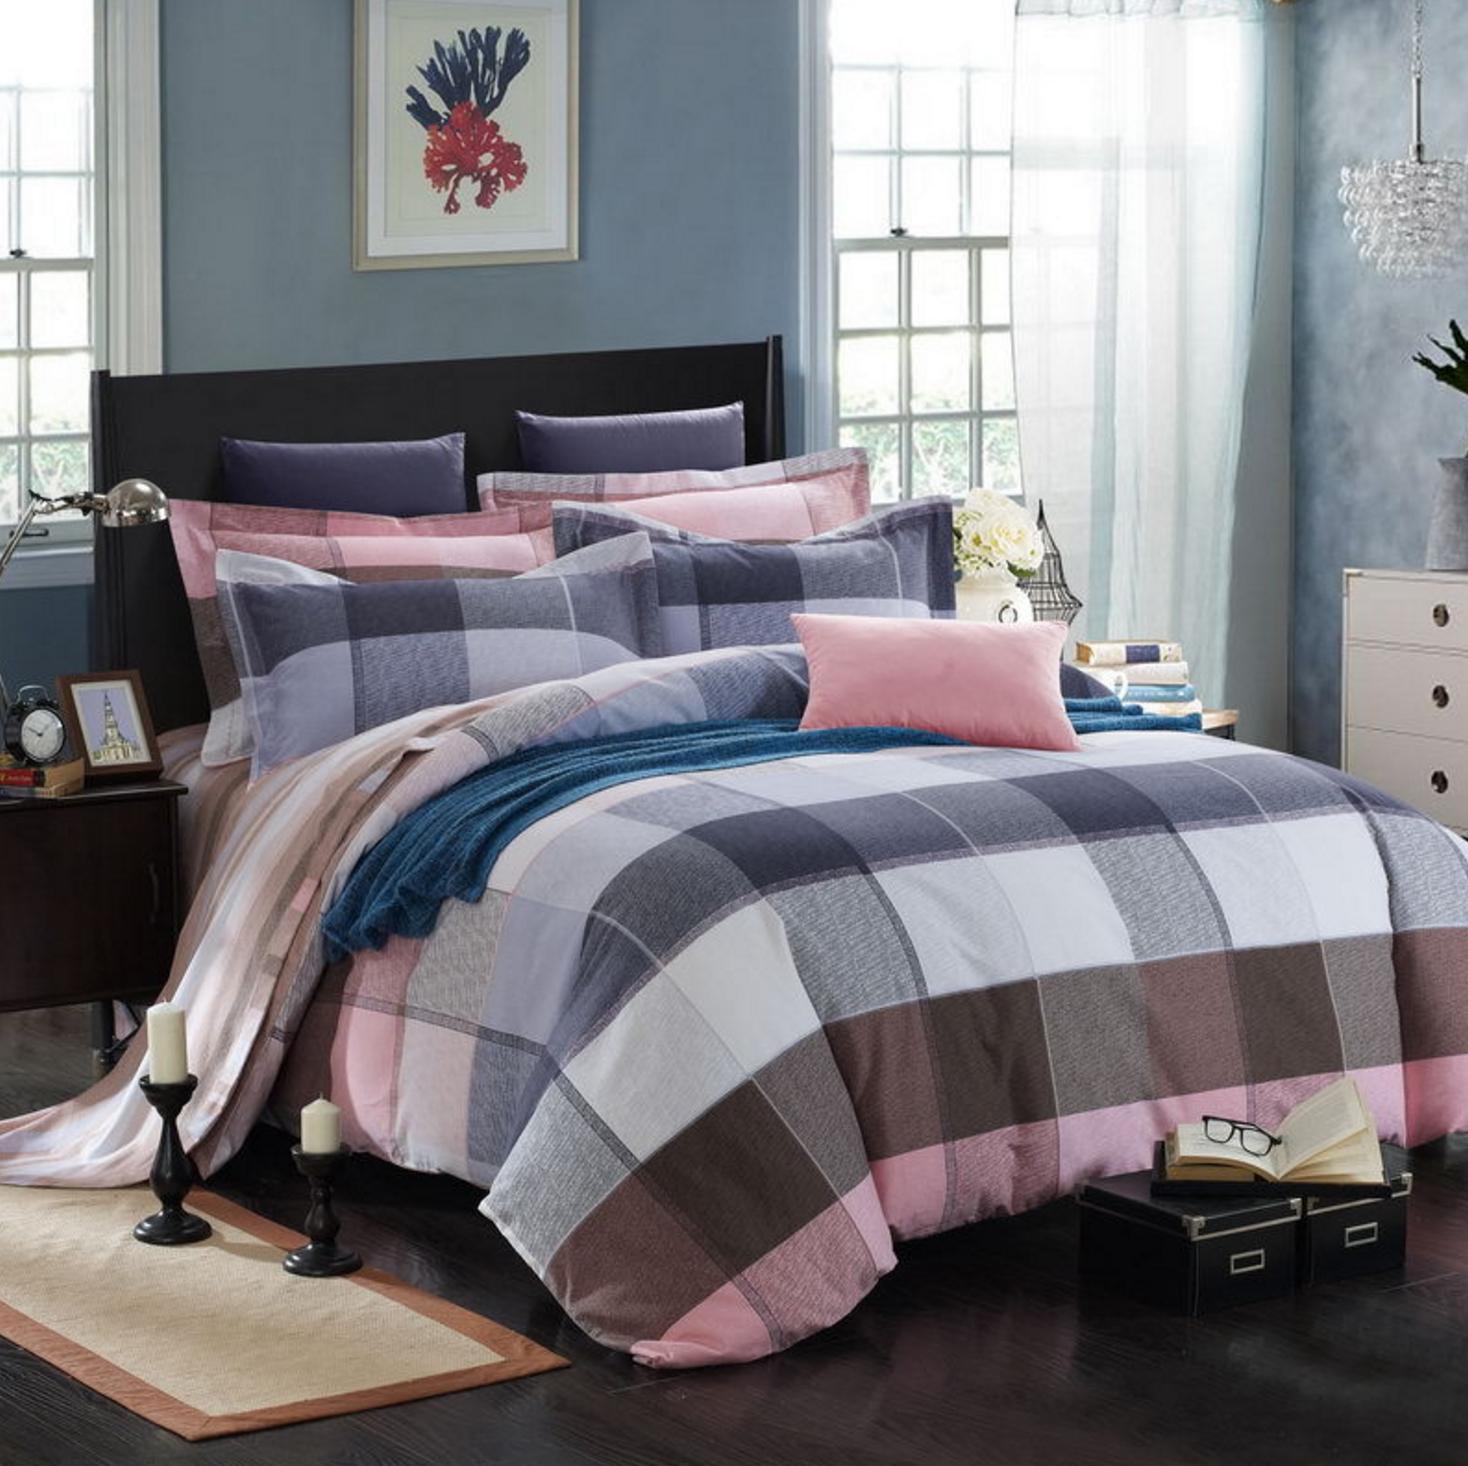 Cute 4 Piece Cotton Bedding Set